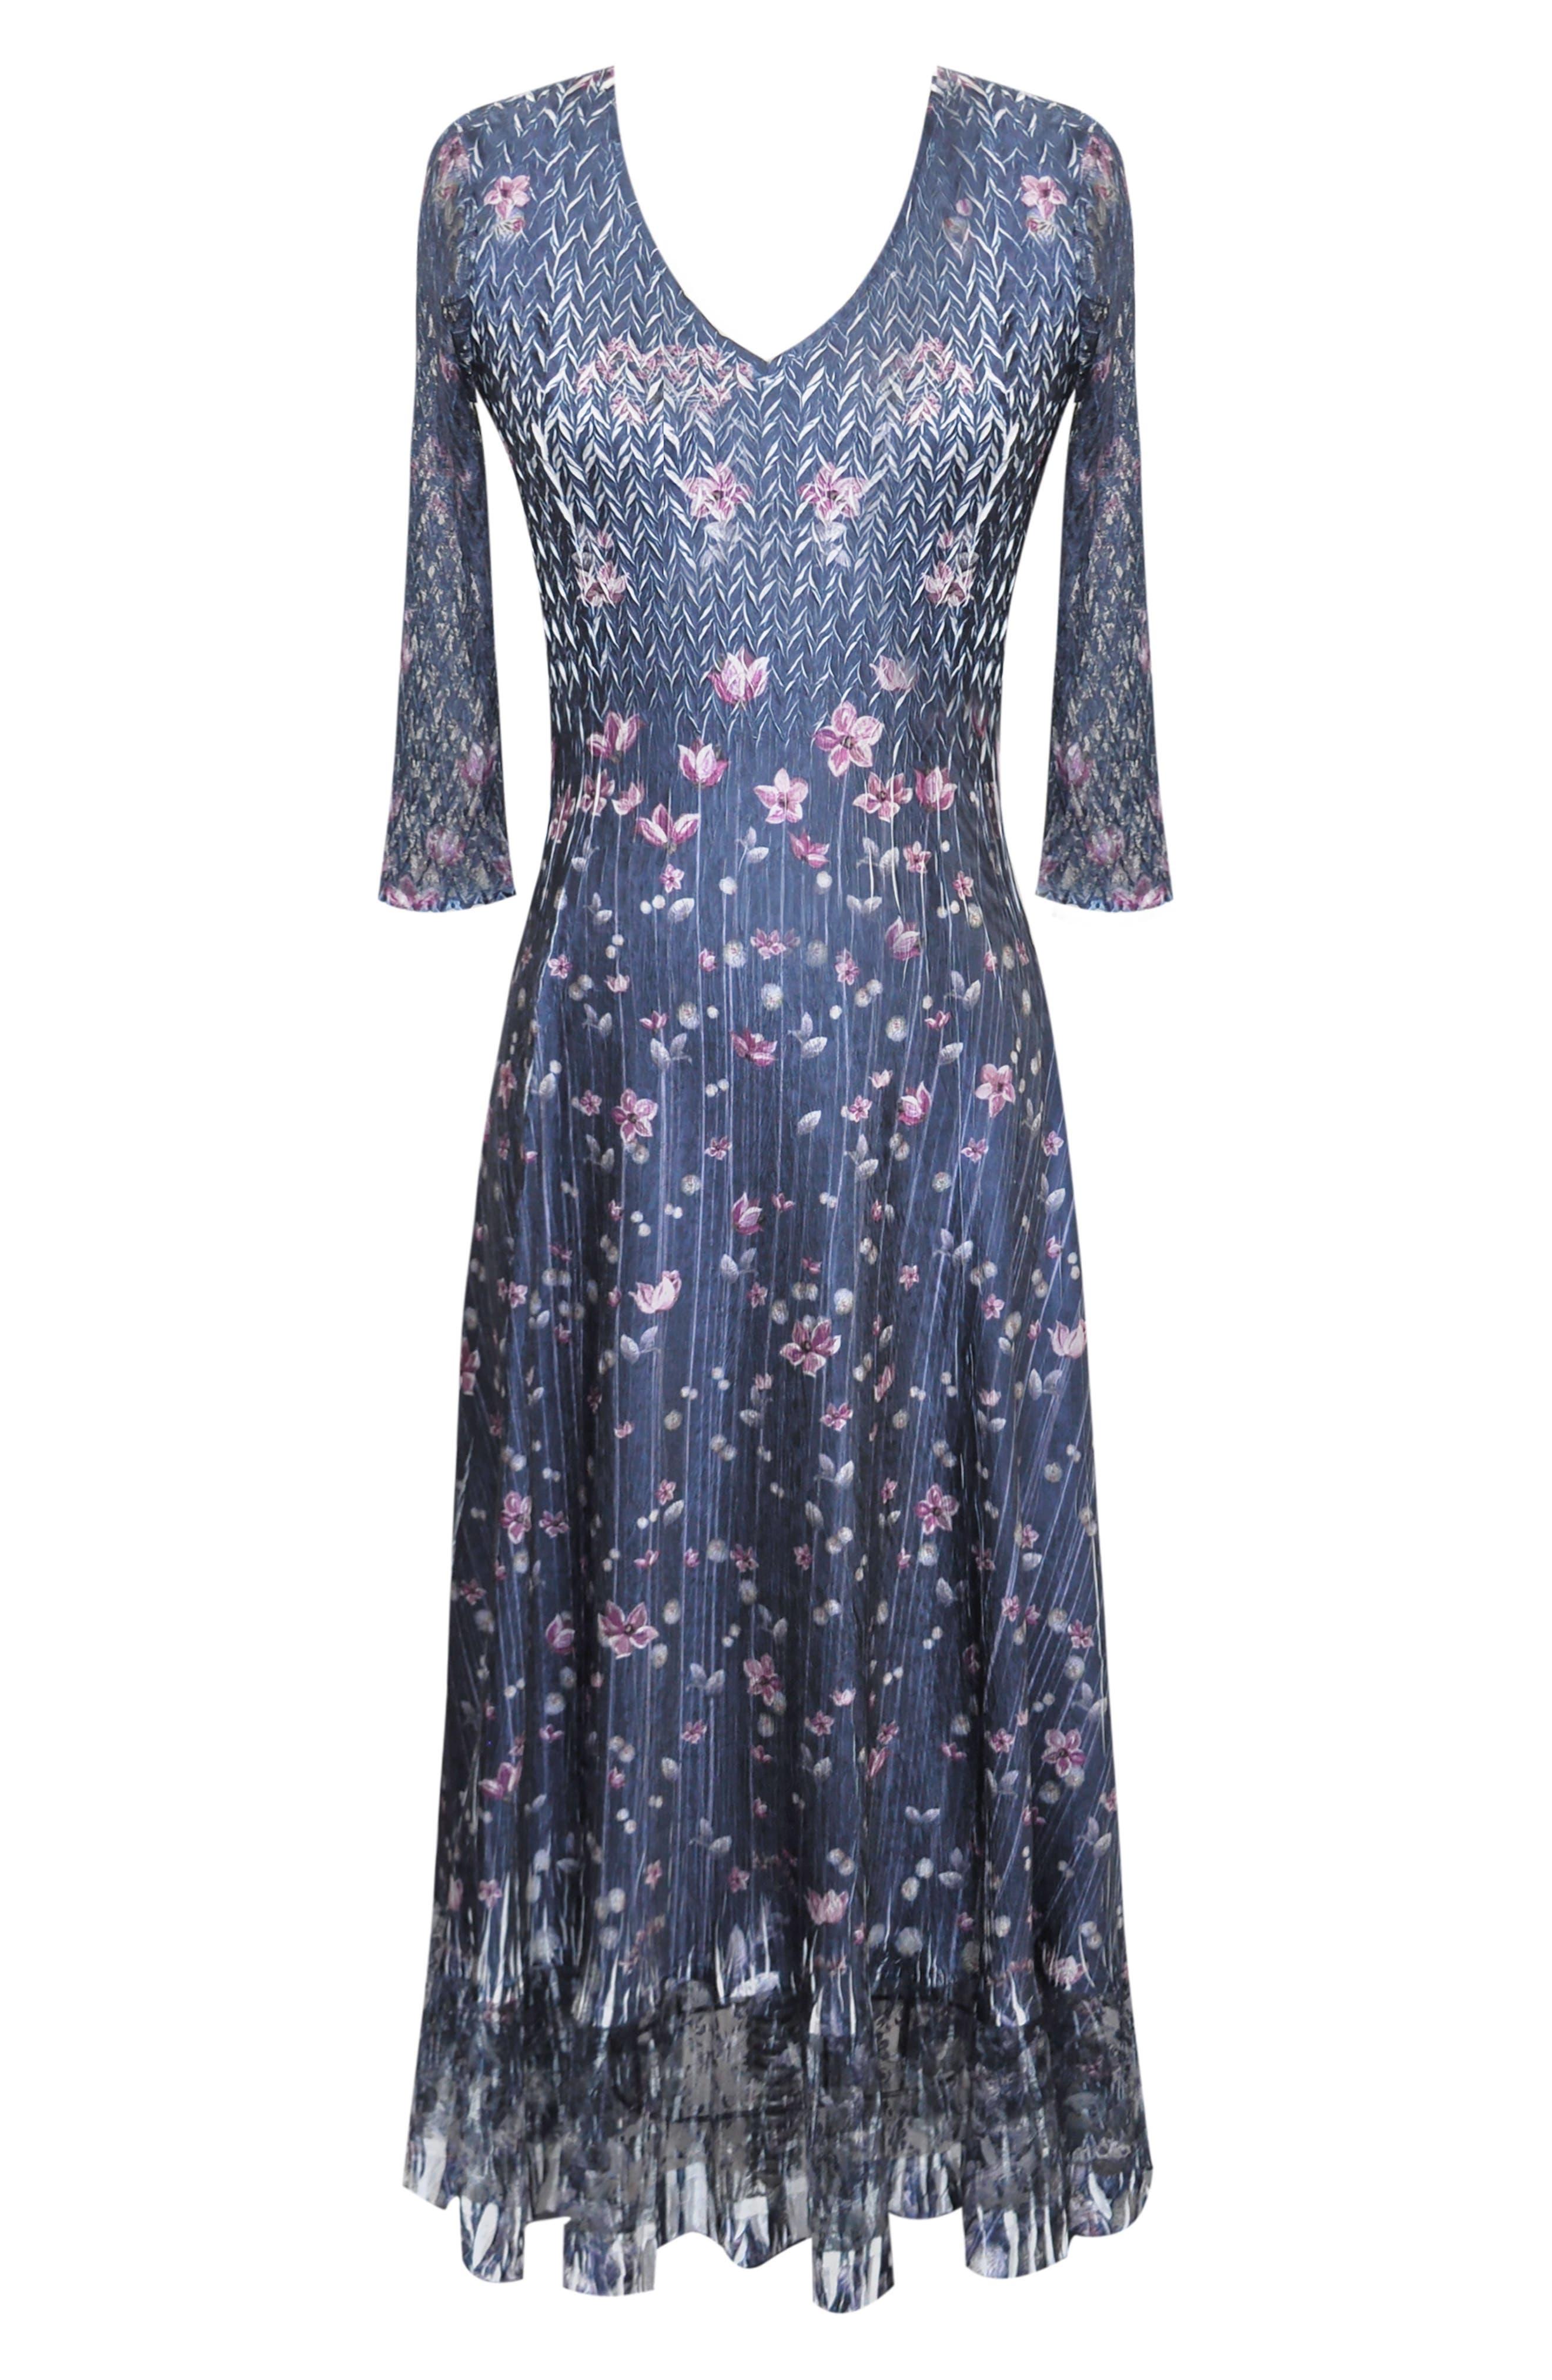 KOMAROV, Lace Sleeve Charmeuse Midi Dress, Alternate thumbnail 4, color, WILD THISTLE